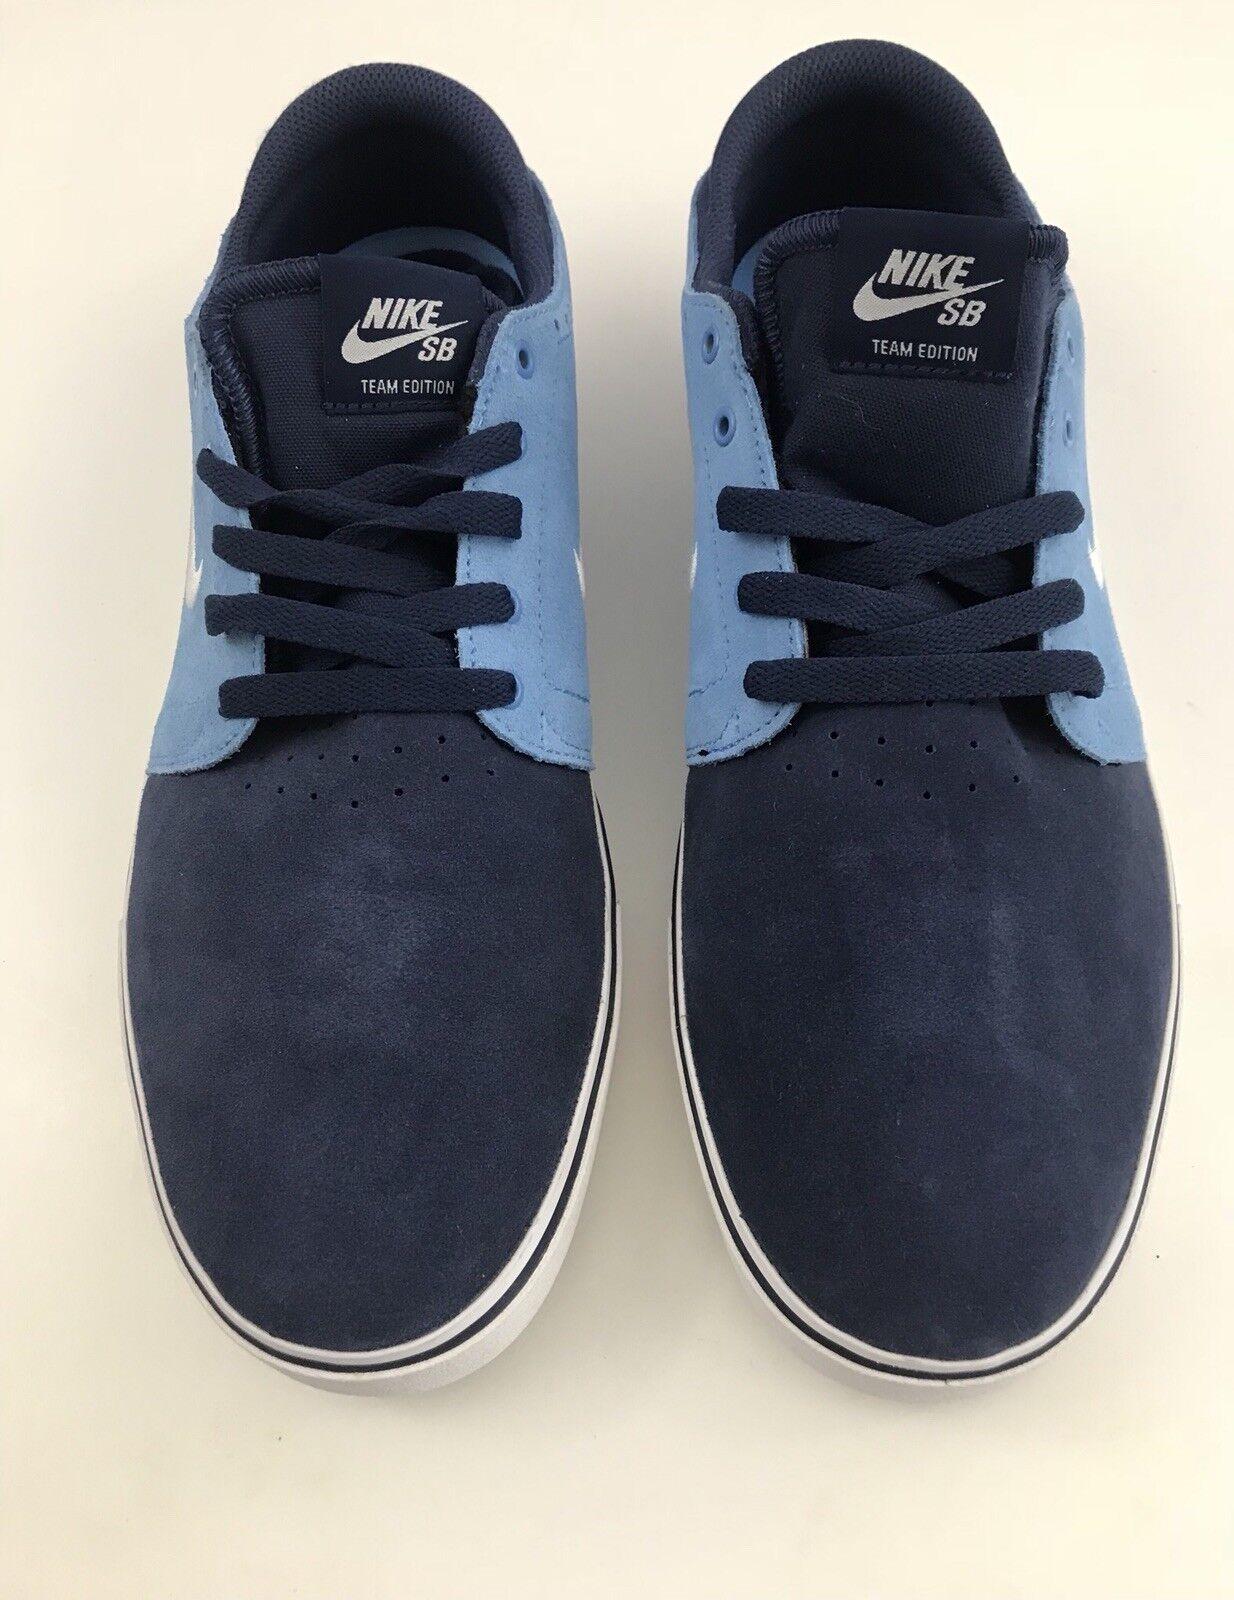 Nike SB TEAM EDITION Team  Men's Sneakers shoes sz 13